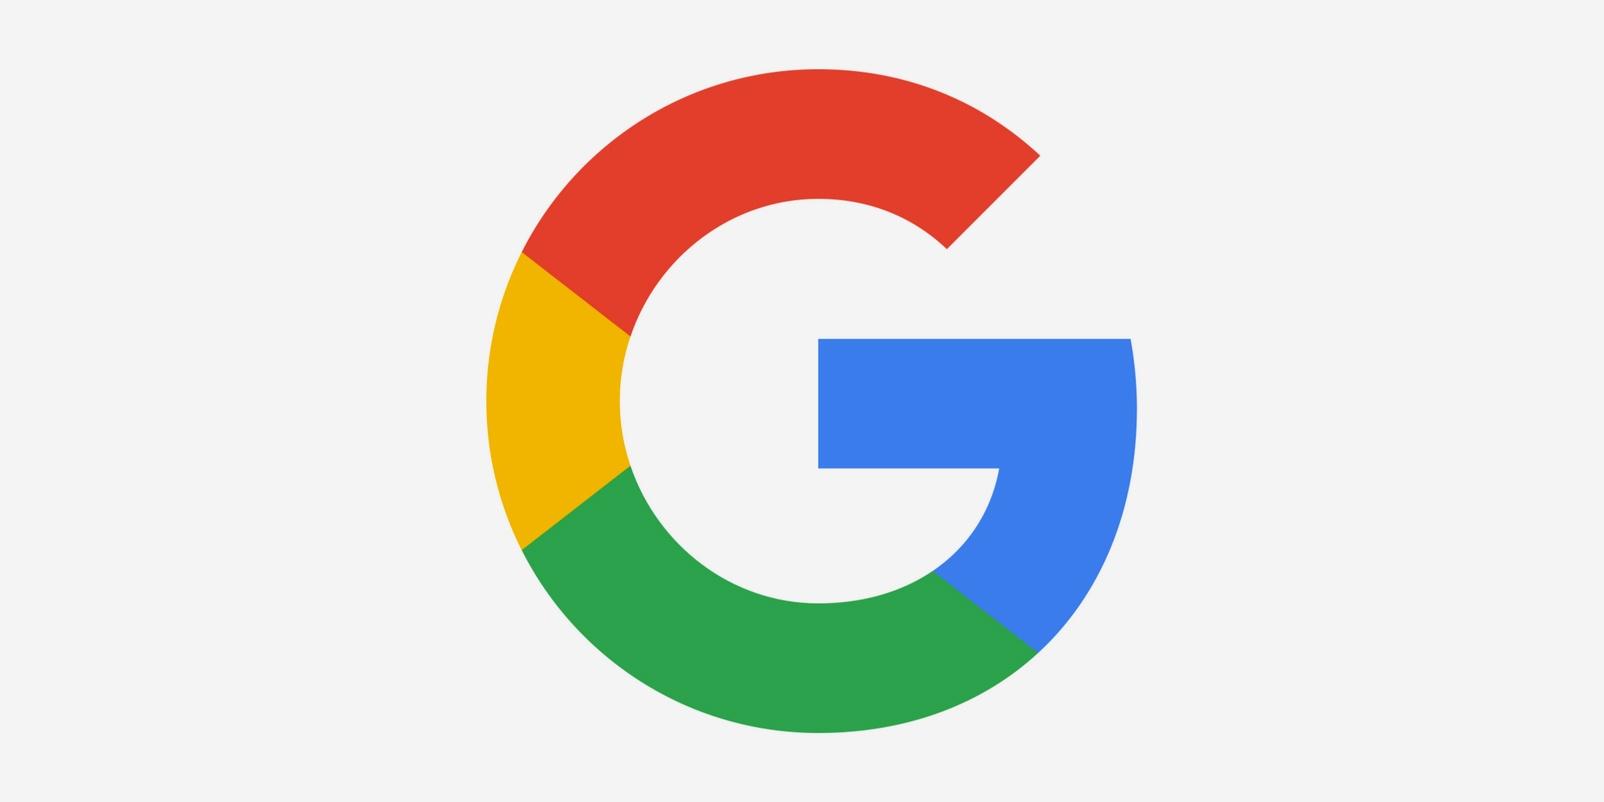 The Secret History of the Google Logo